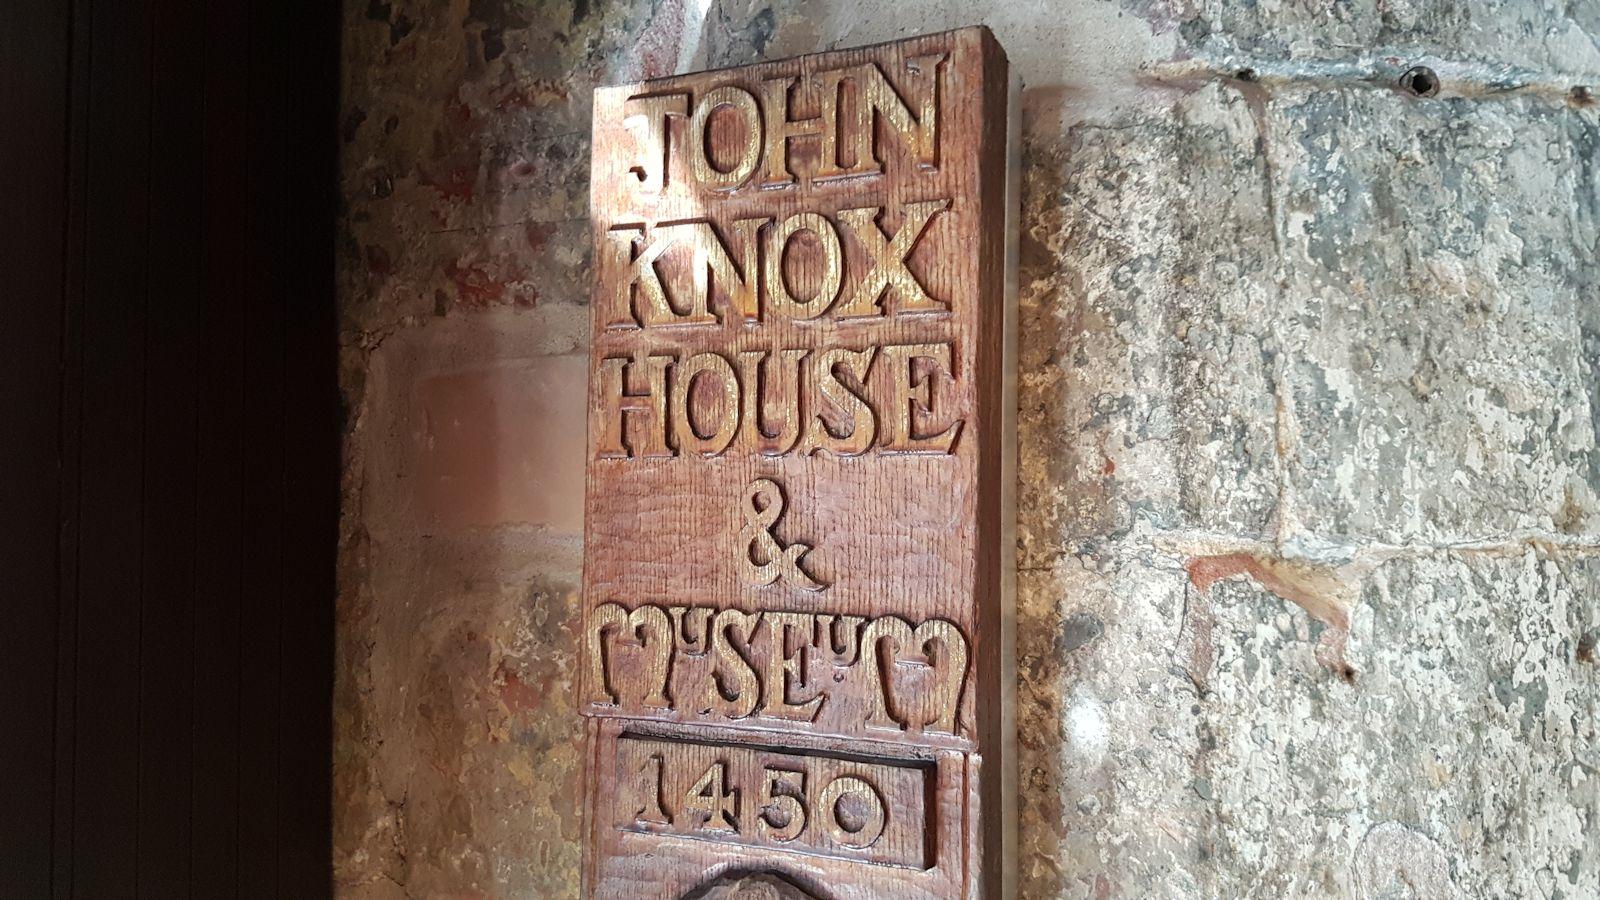 John Knox House Plaque